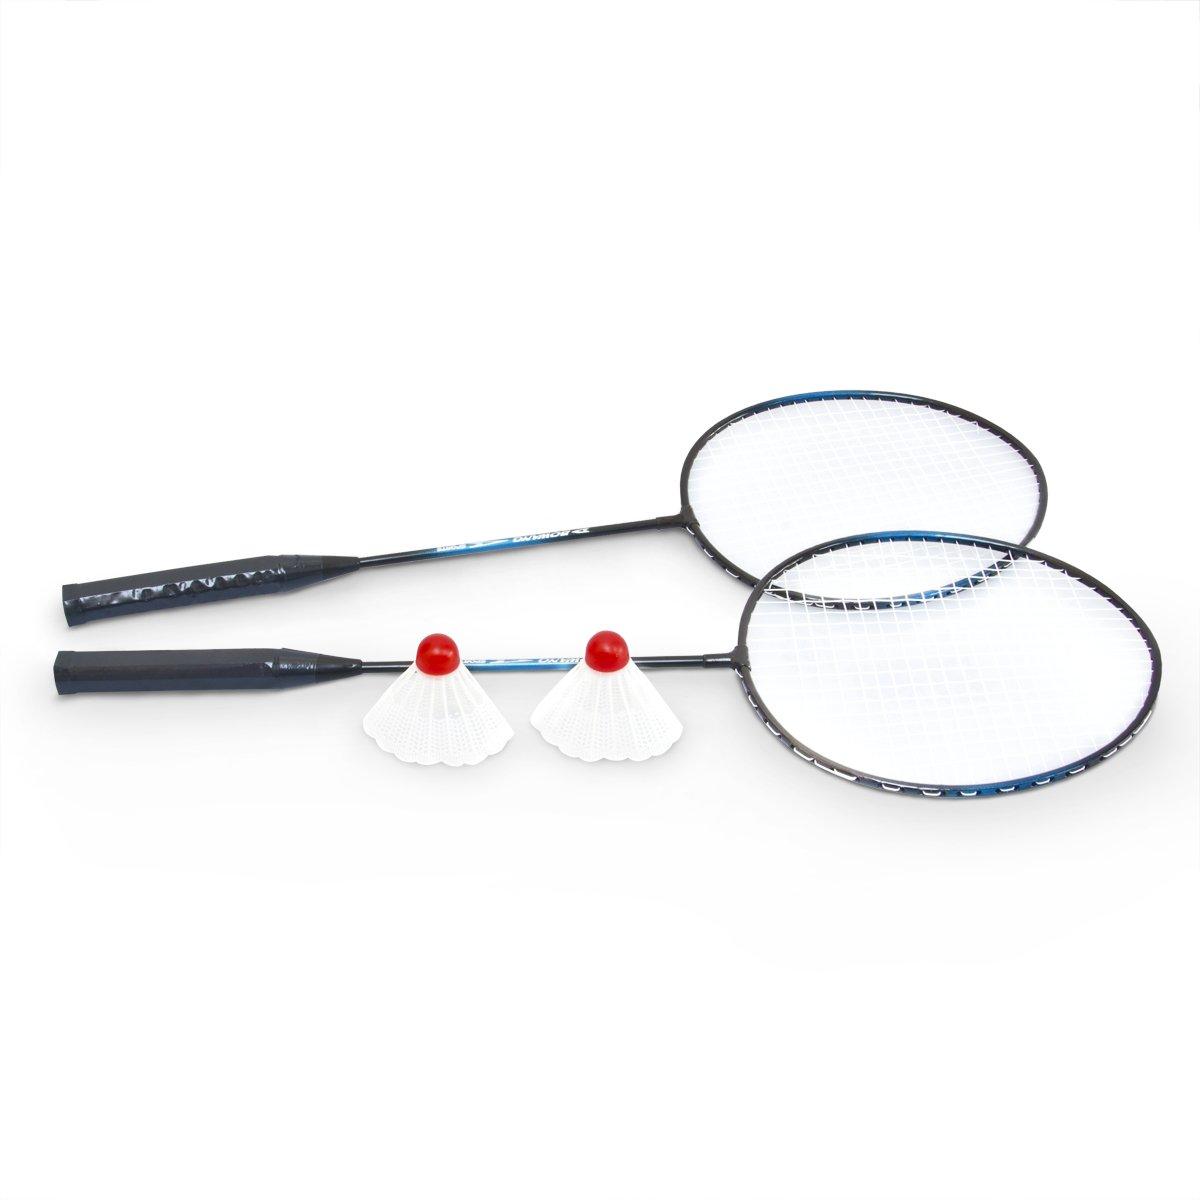 Badminton Federball Set 4-teilig Blau-Schwarz Aluminium